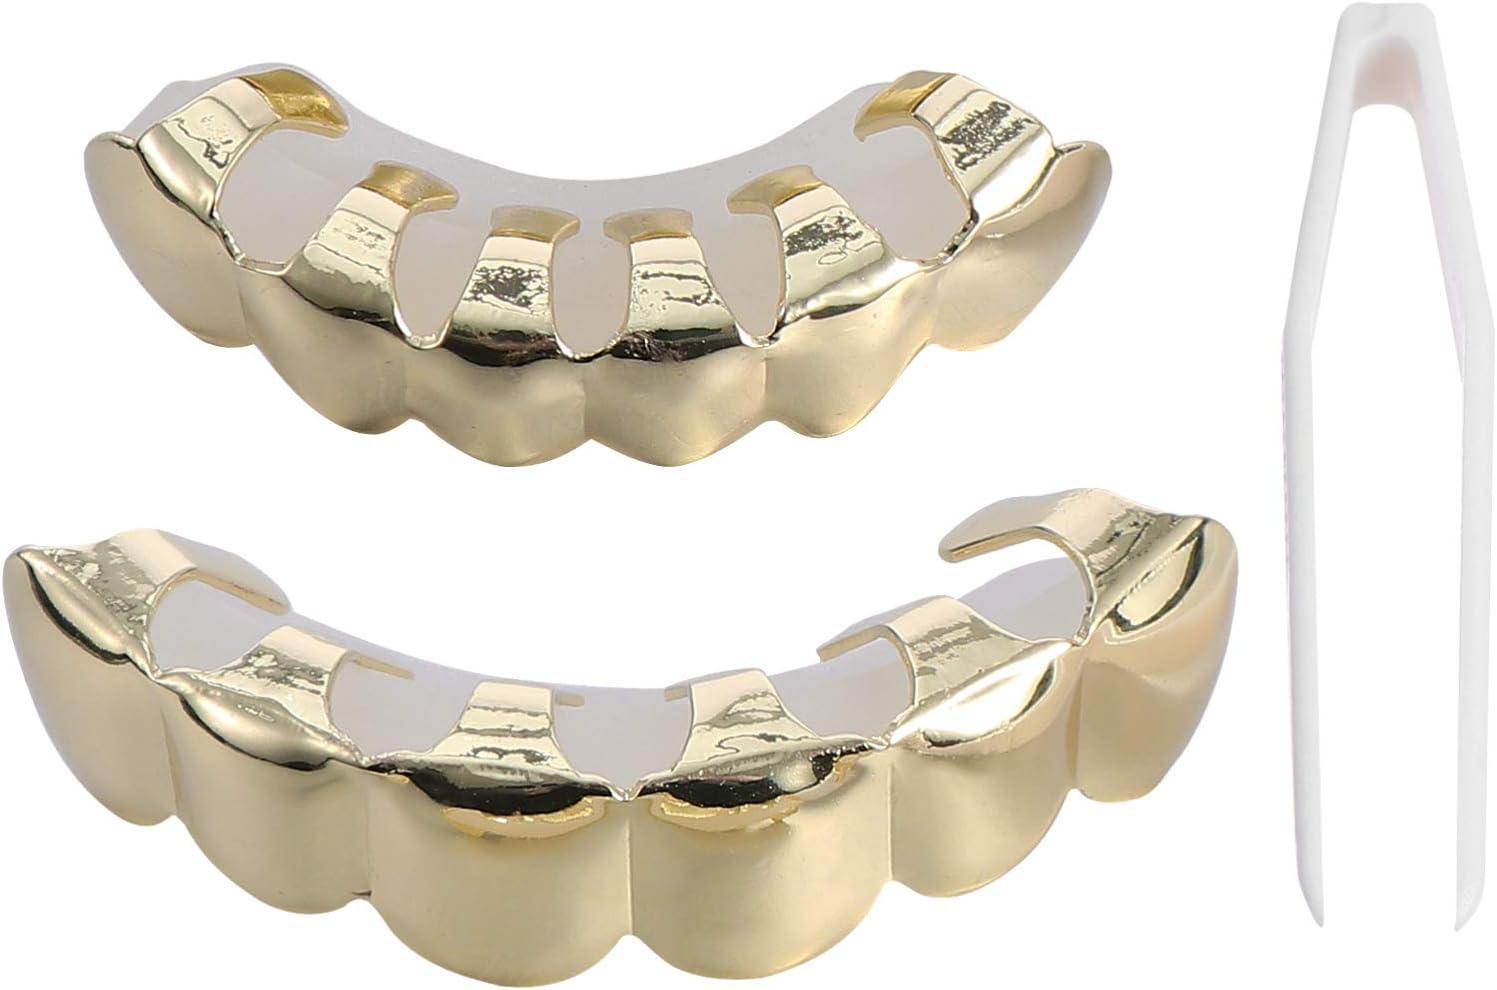 ARTIBETTER 1 Set Hip Hop Teeth Grill Decoration Metal Golden Plated Tooth Cap for Men Women Cosplay Accessory